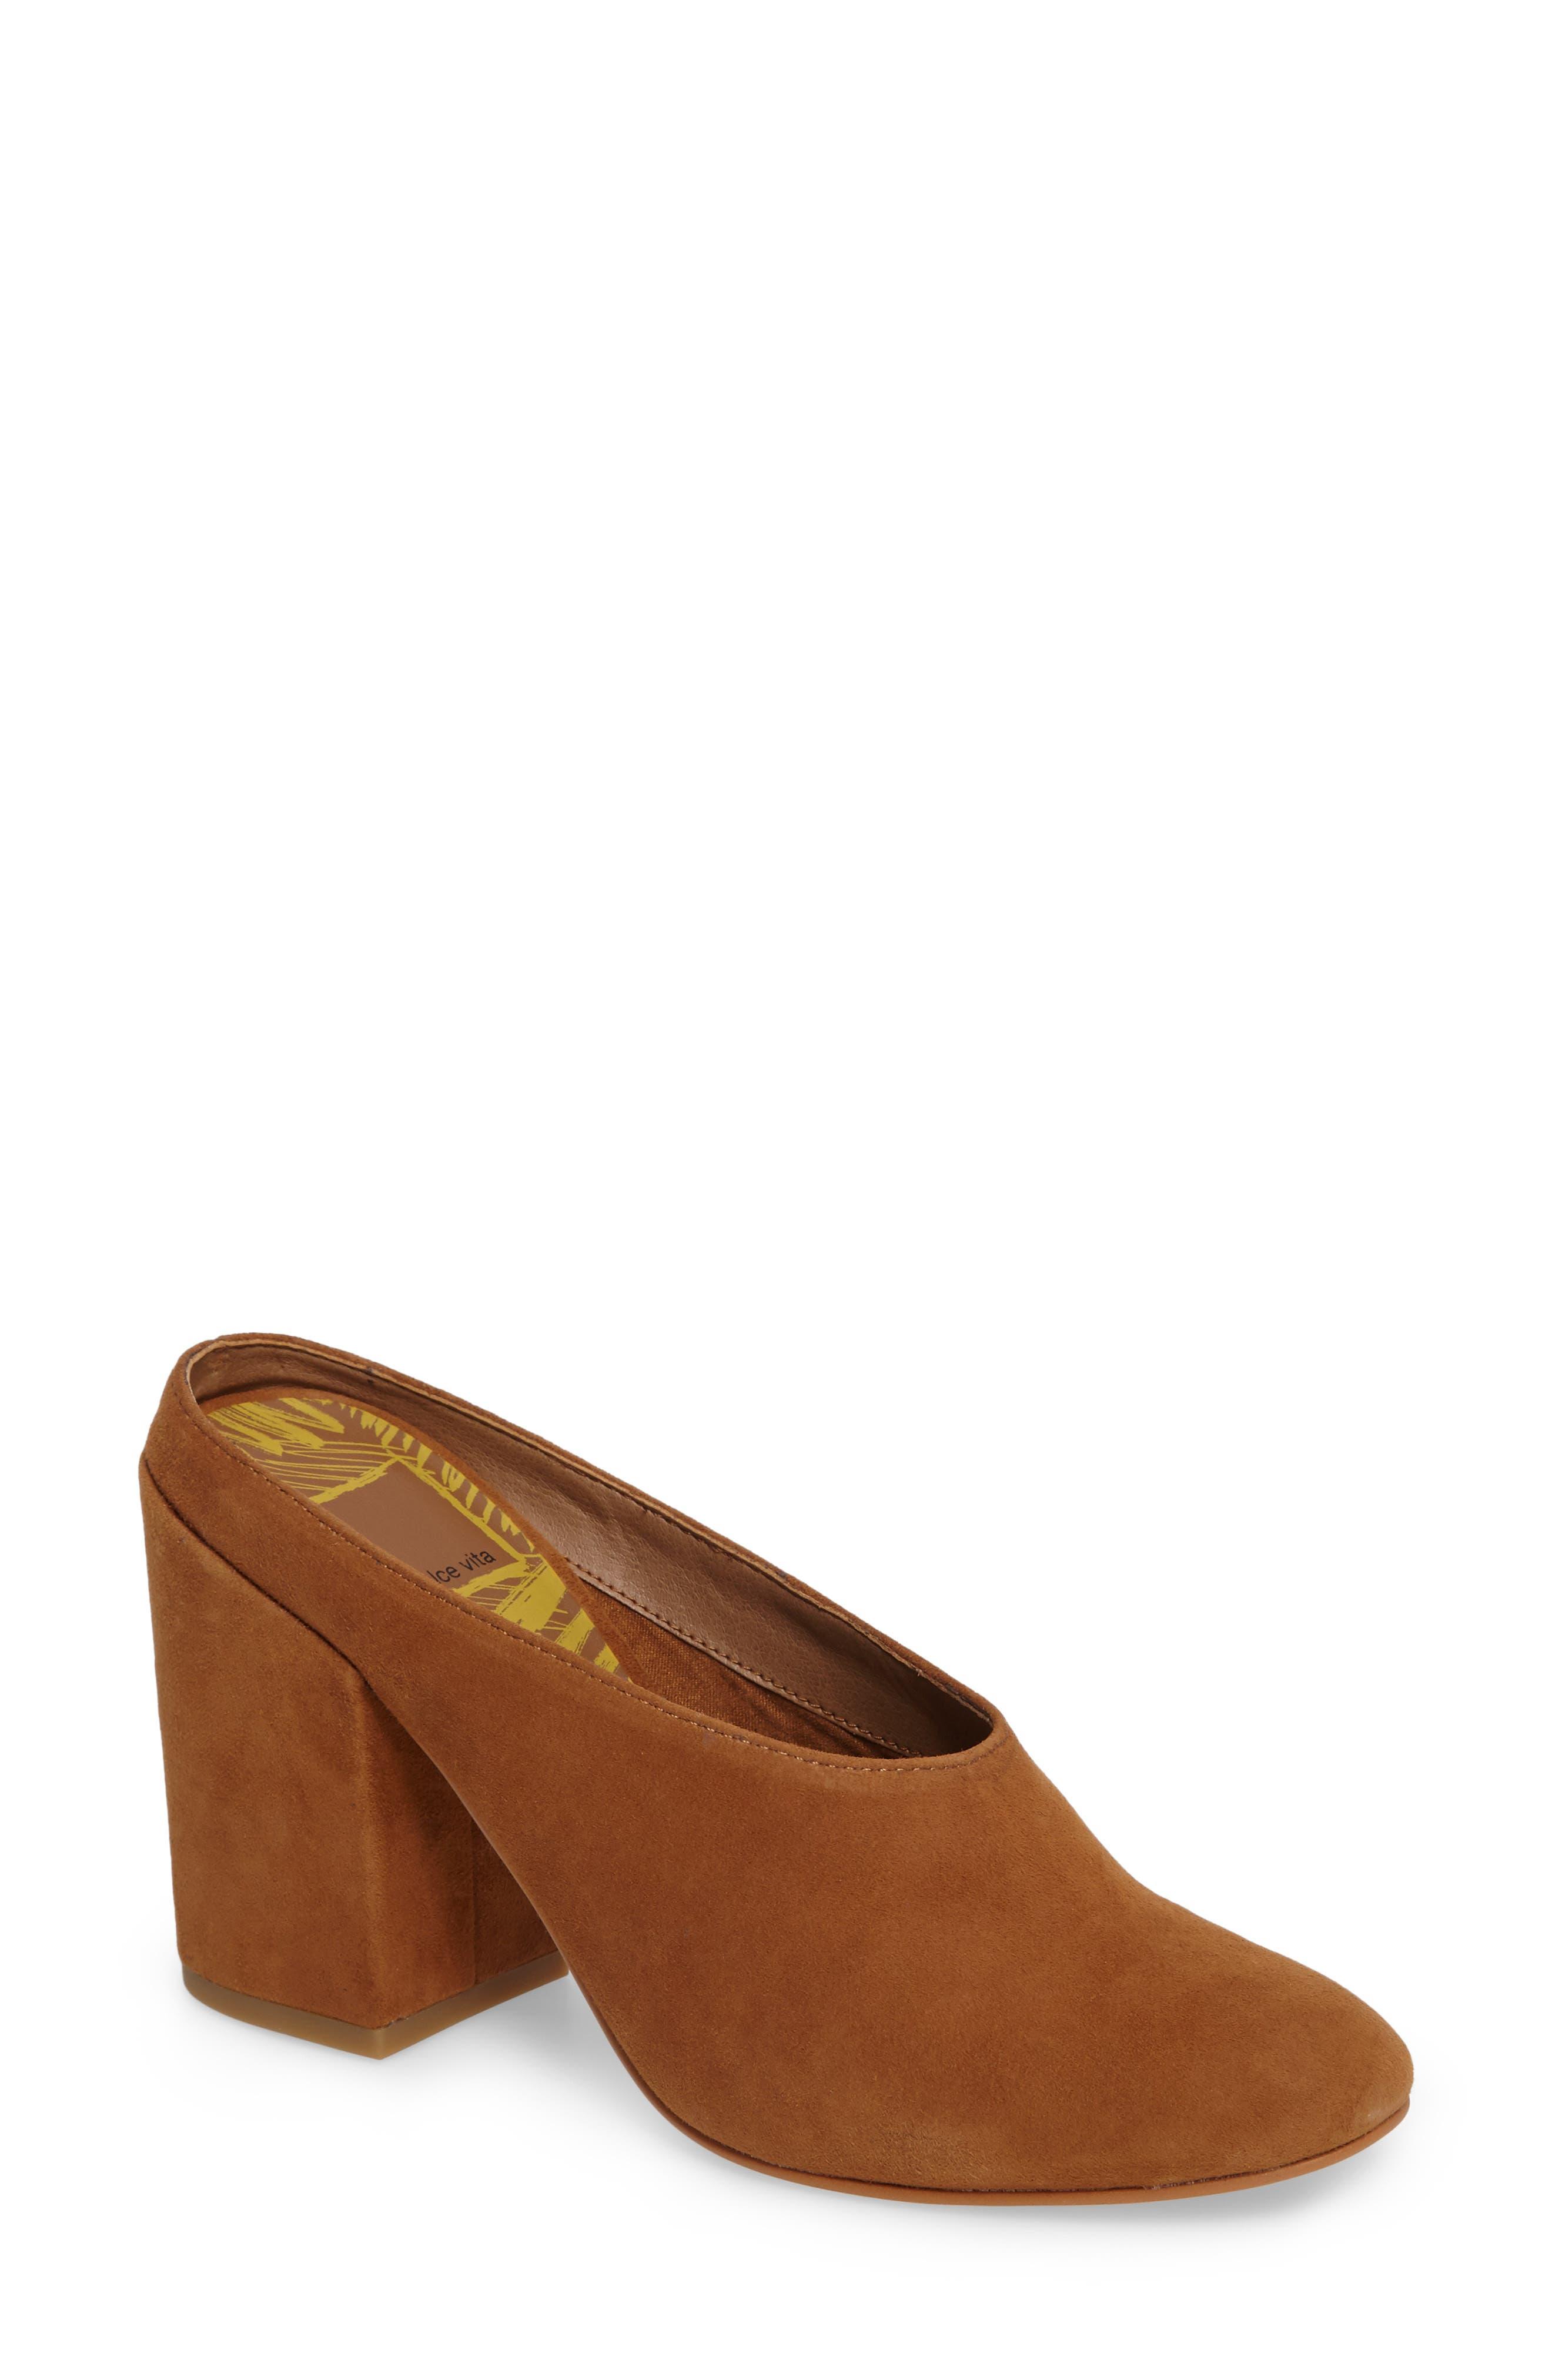 Dolce Vita Caley Block Heel Mule (Women)